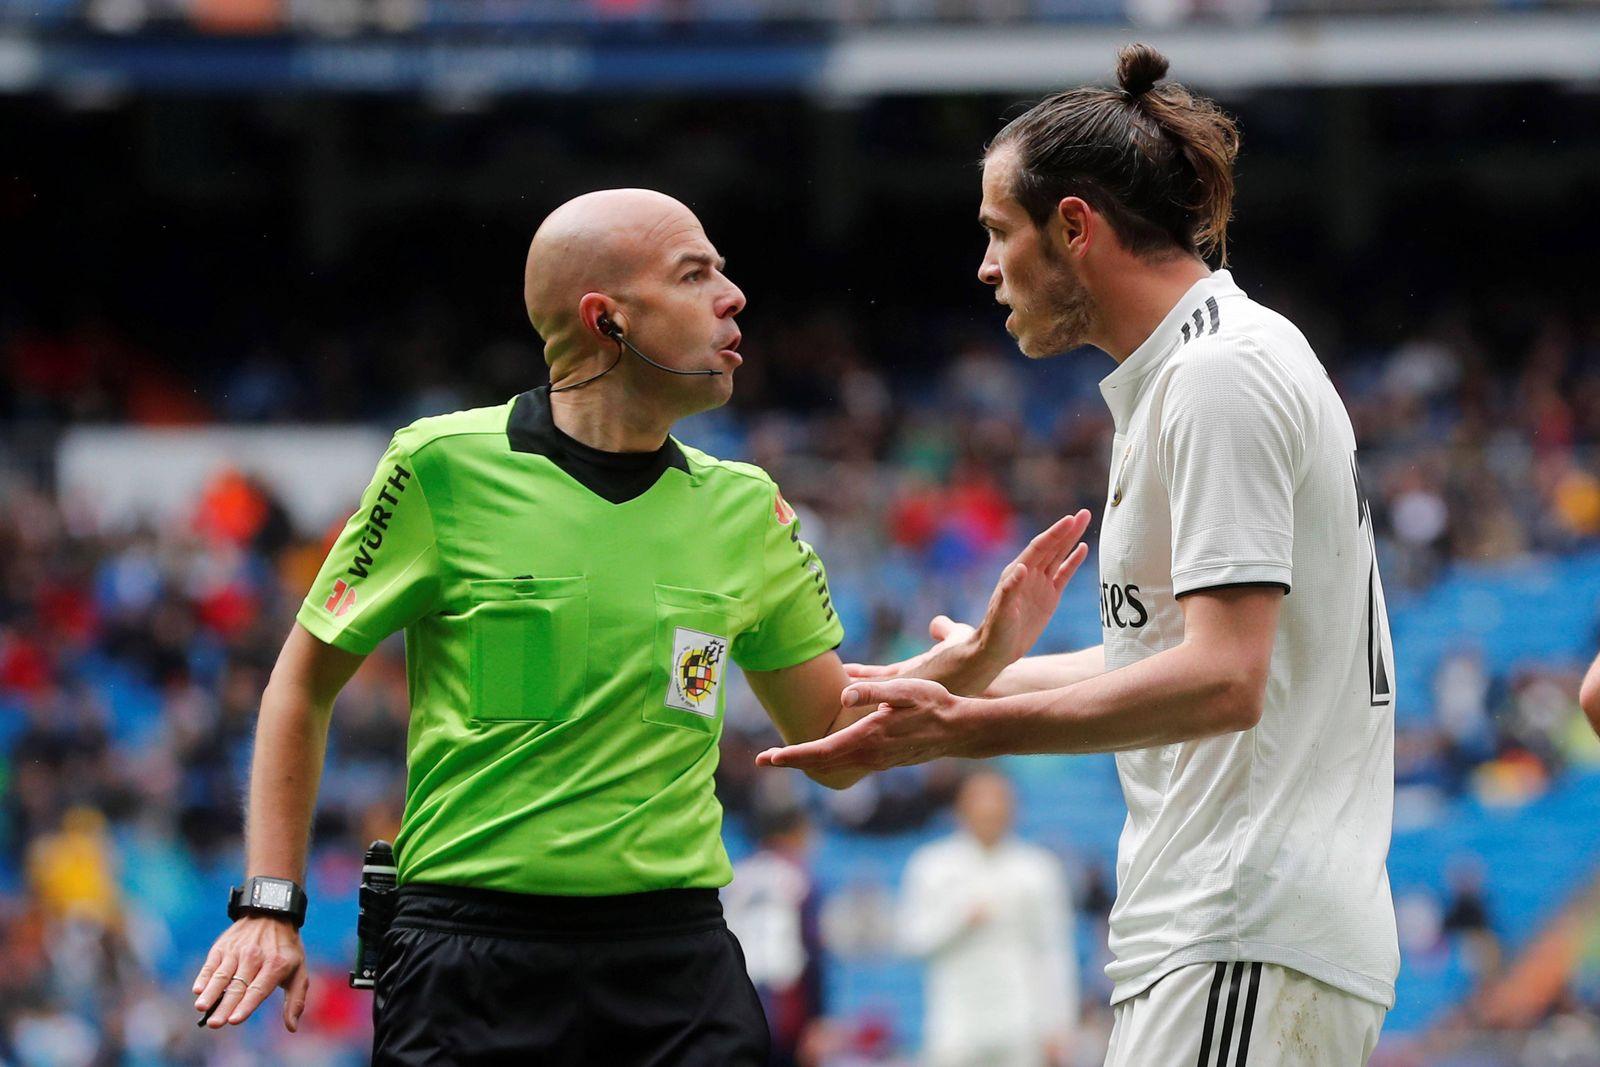 Fußball Real Madrid SD Eibar Real Madrid s Gareth Bale R talks with referee Pablo Gonzalez L